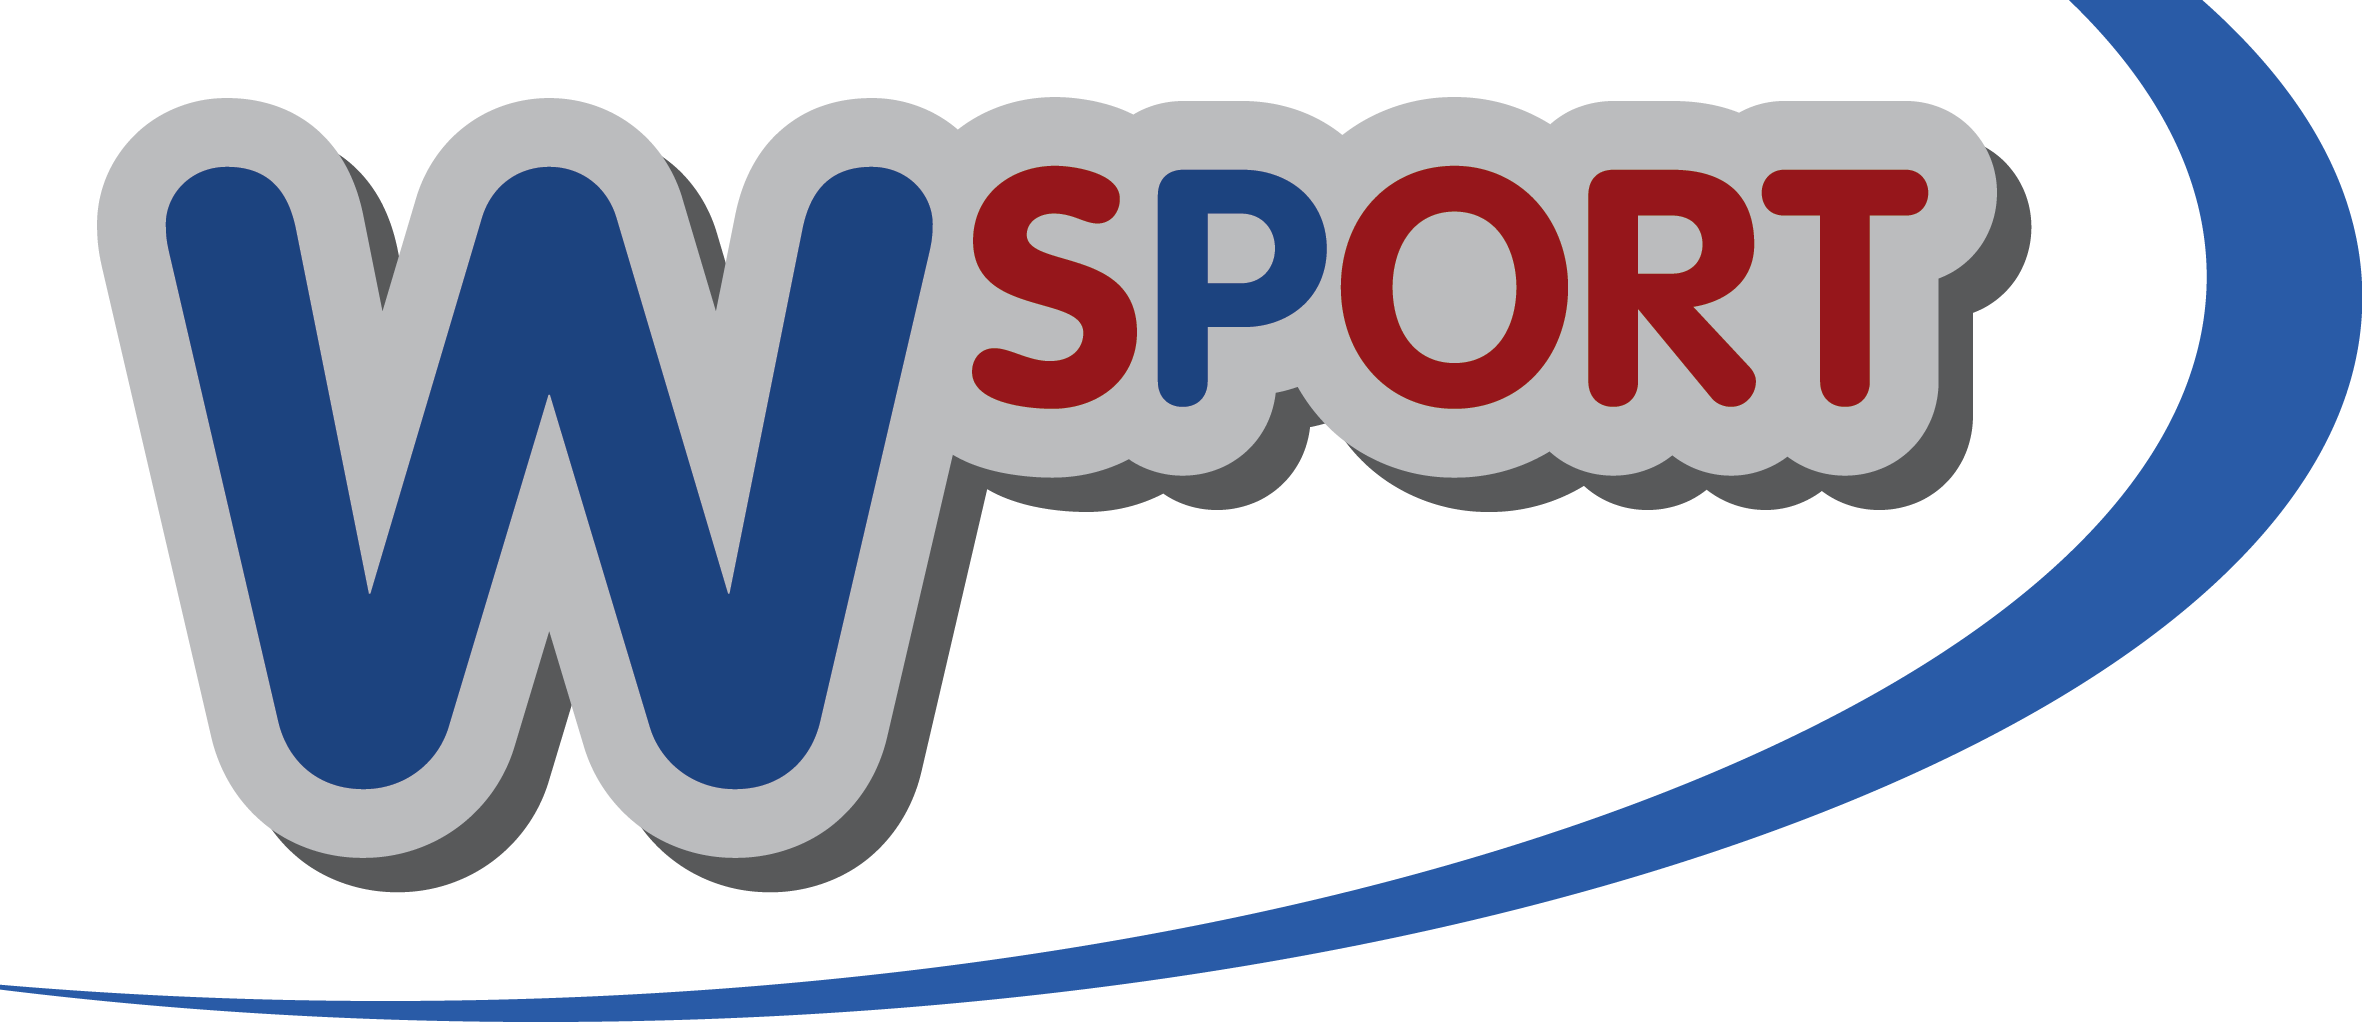 Wsport